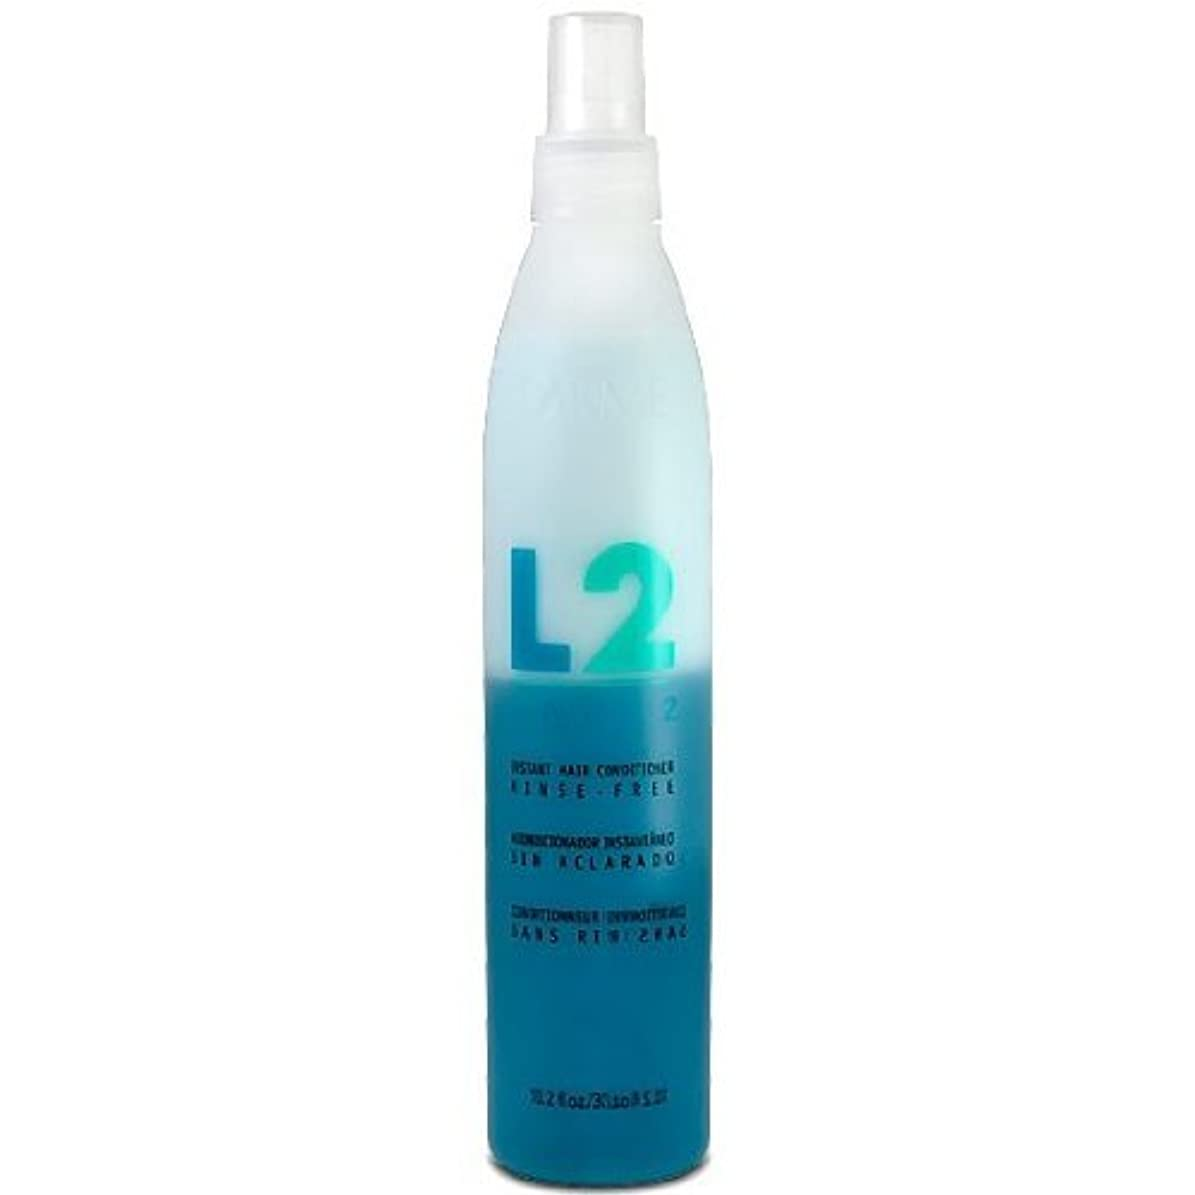 光行方不明合計Lakme Lak 2 Instant Hair Conditioner 10.2 Oz [並行輸入品]